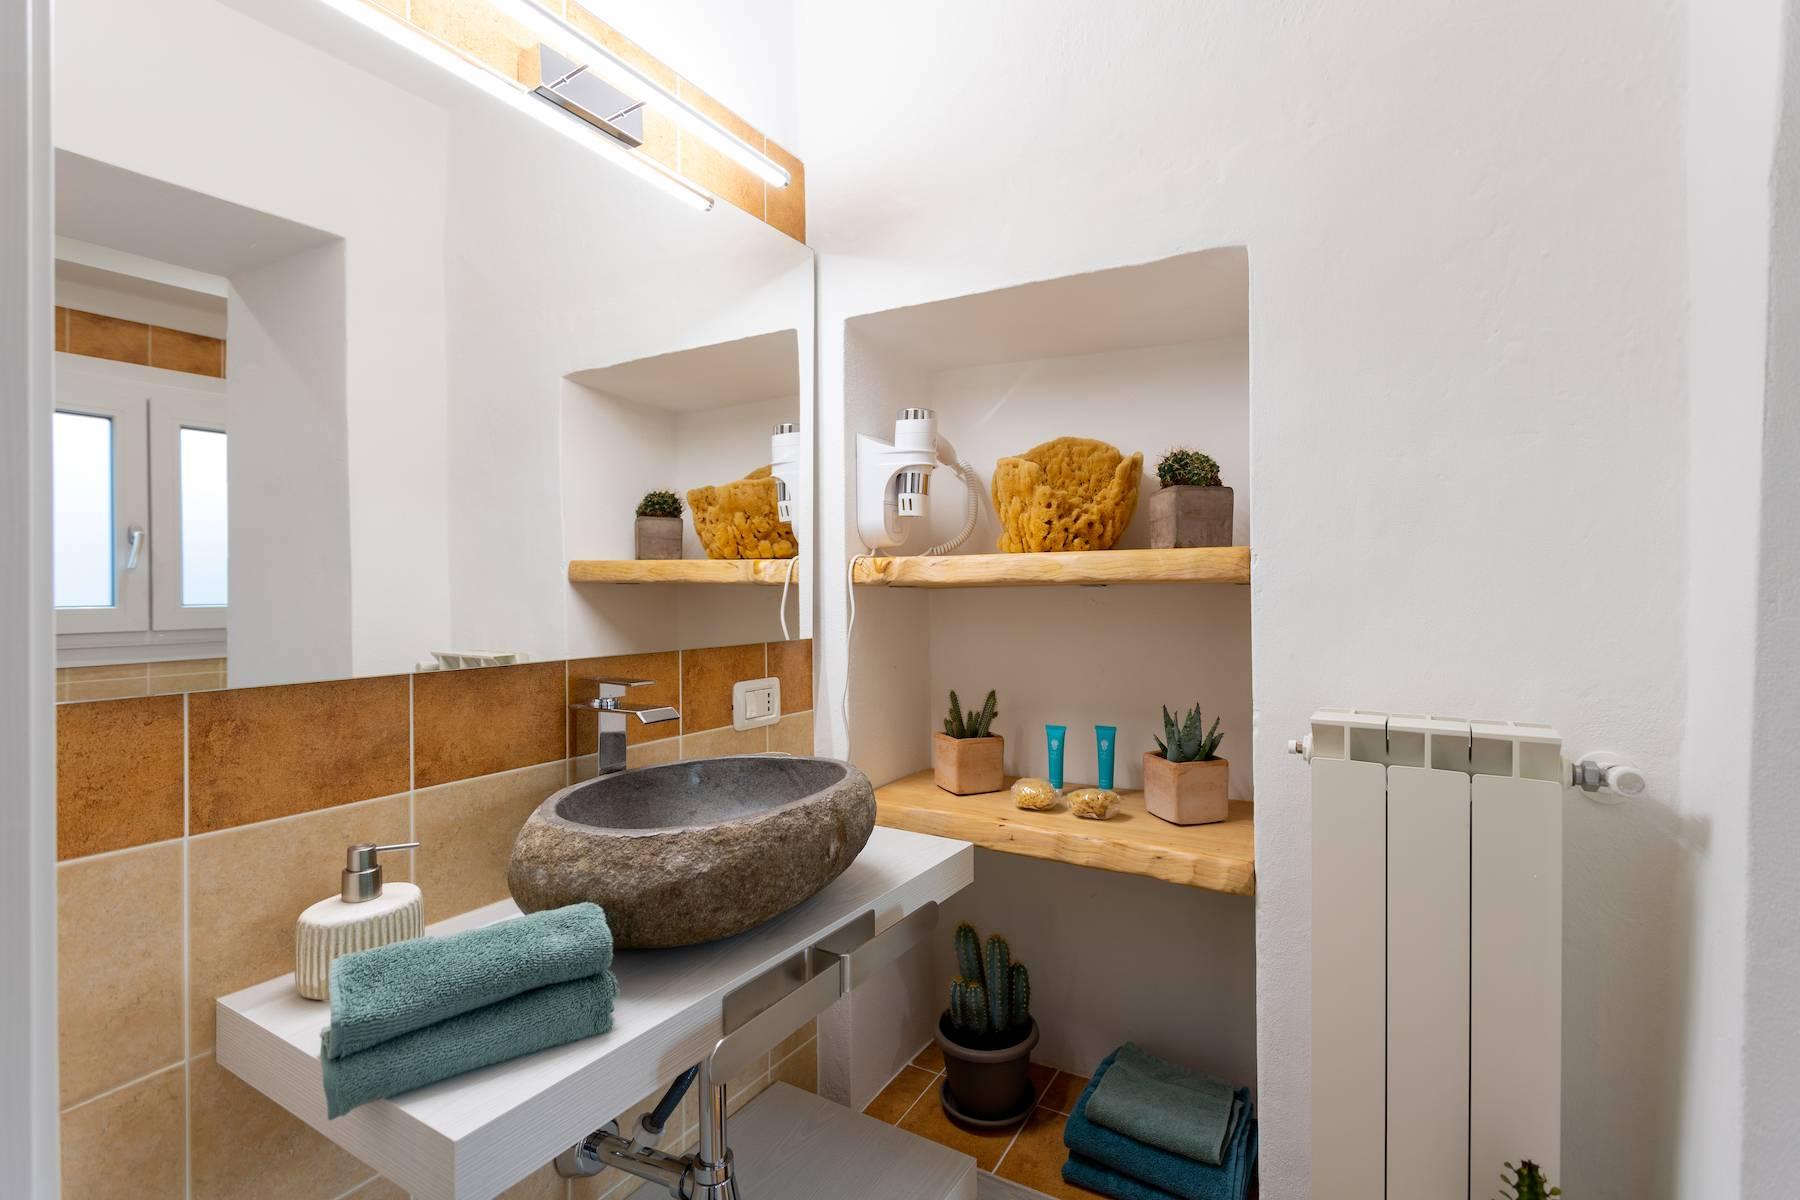 Appartamento in Vendita a Belgirate: 3 locali, 62 mq - Foto 21